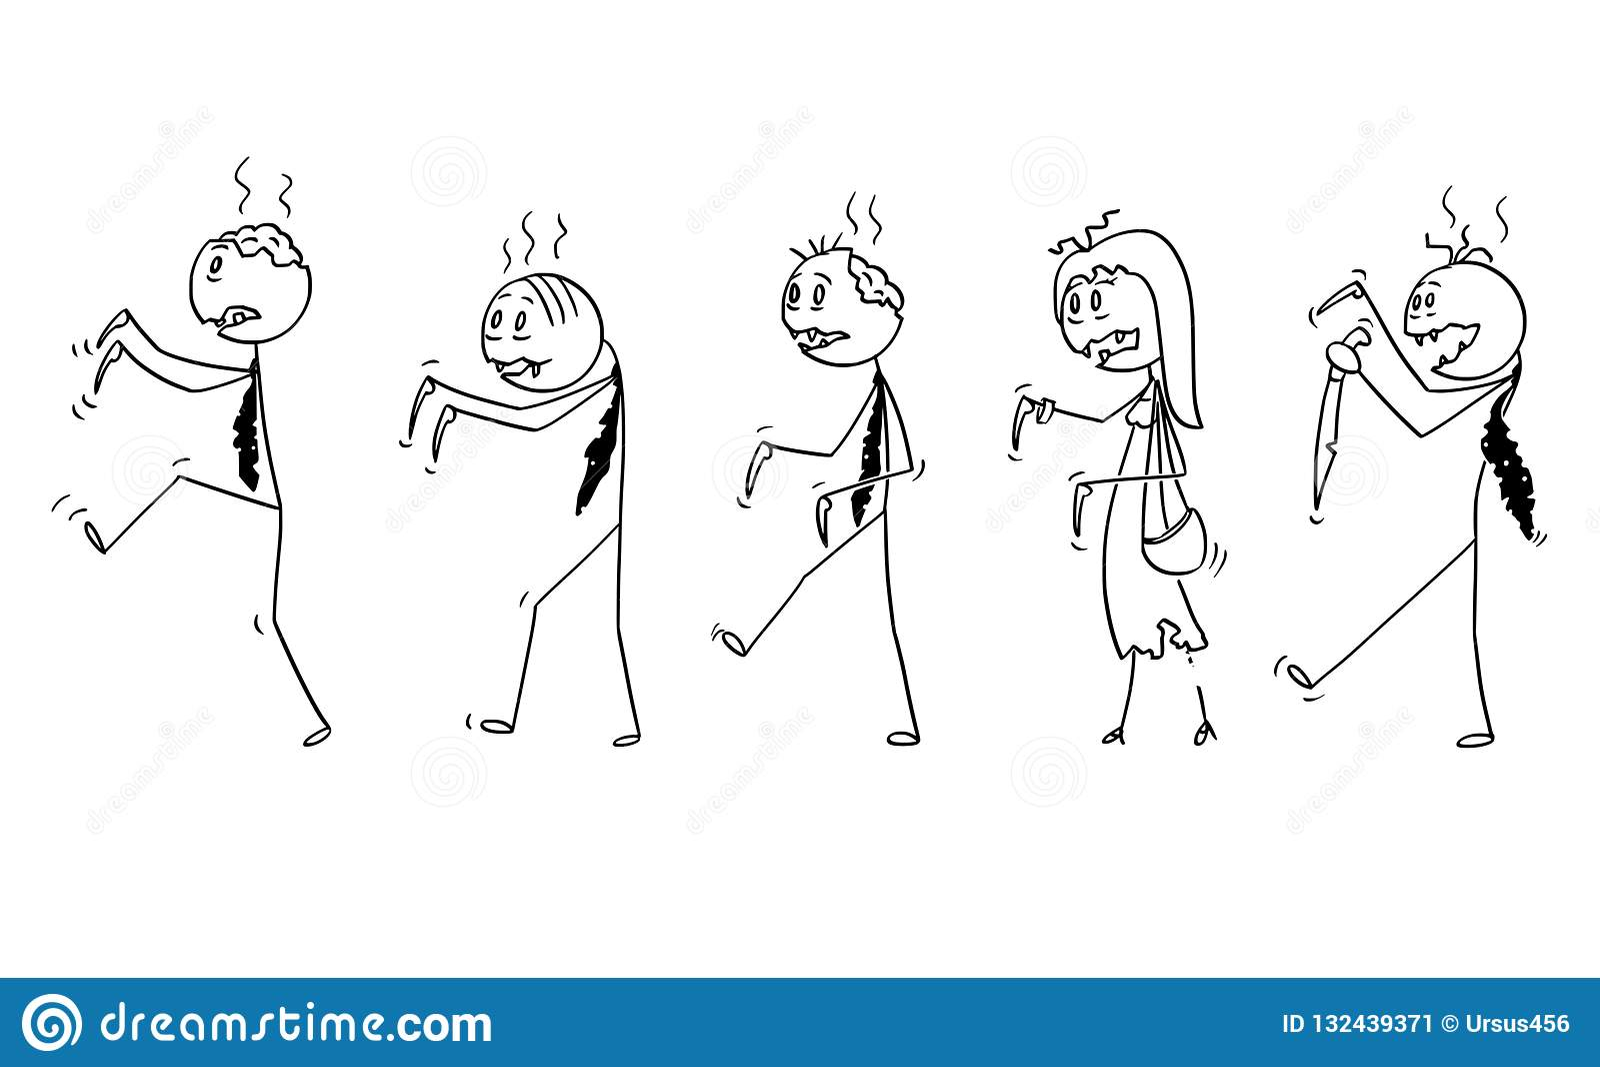 Cartoon of Group of Five Undead Zombie Businessmen Walking